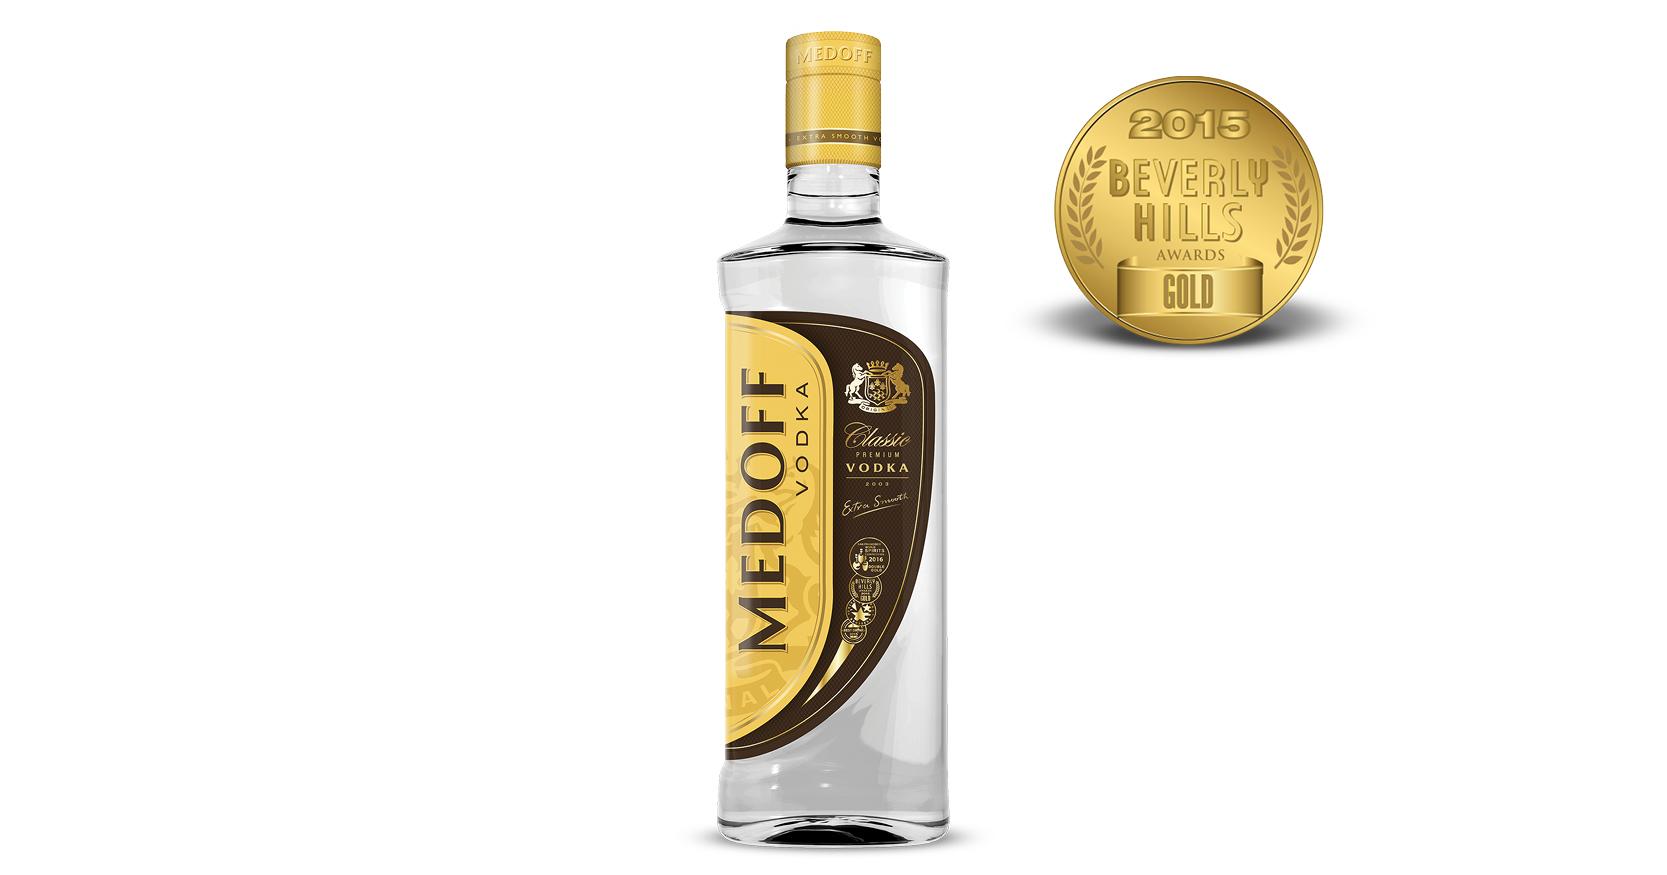 Medoff Classic Vodka